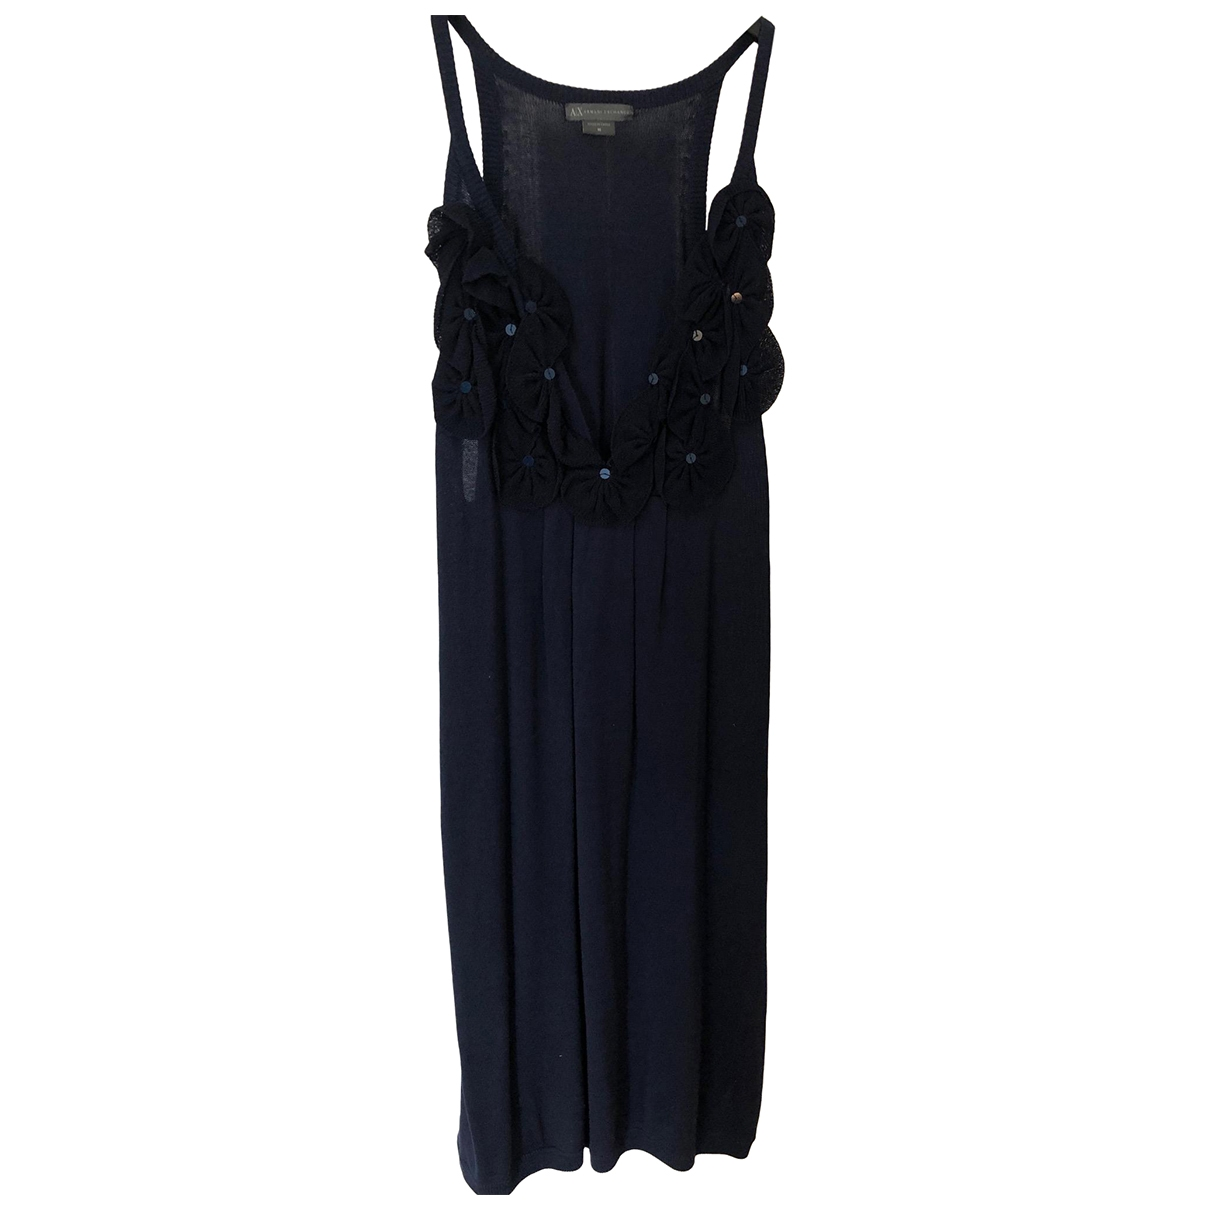 Emporio Armani \N Blue Wool dress for Women M International